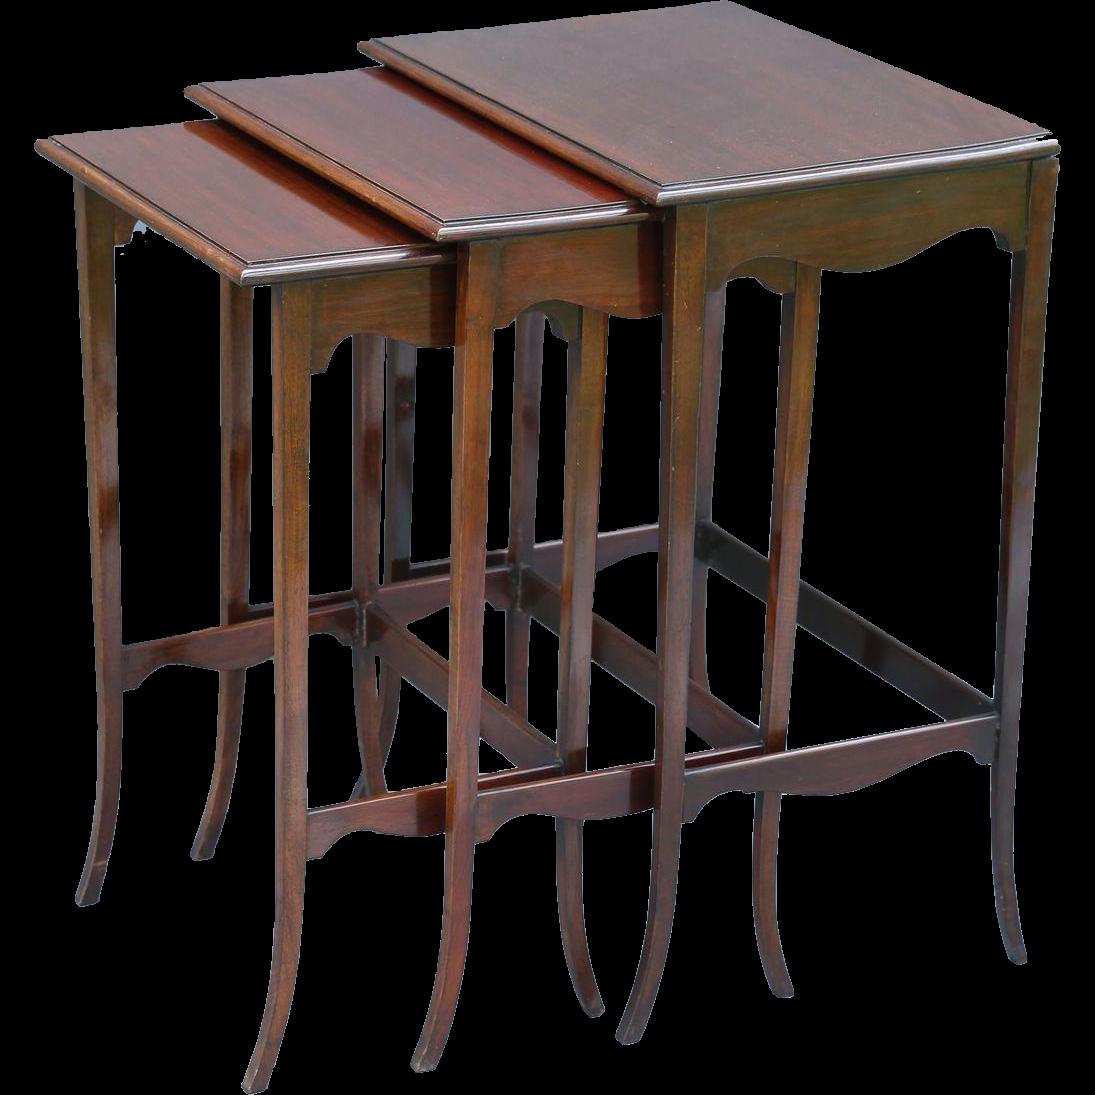 Charming French Mahogany Nesting Tables, Set Of 3